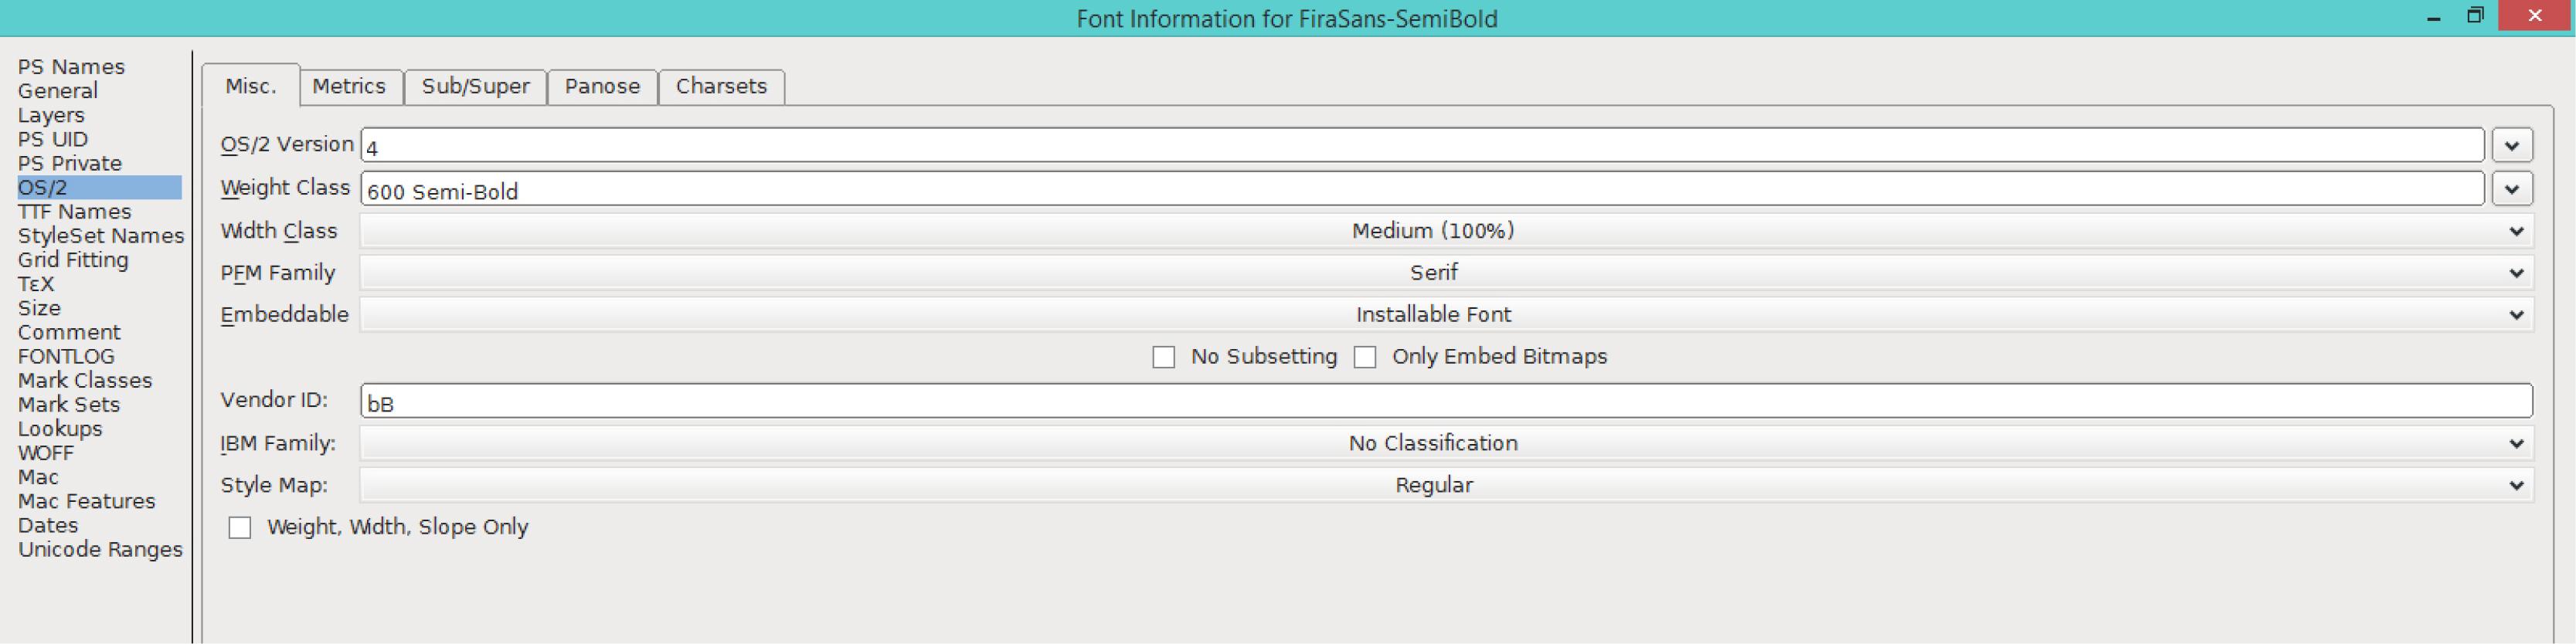 Fira Sans SemiBold (OS/2)